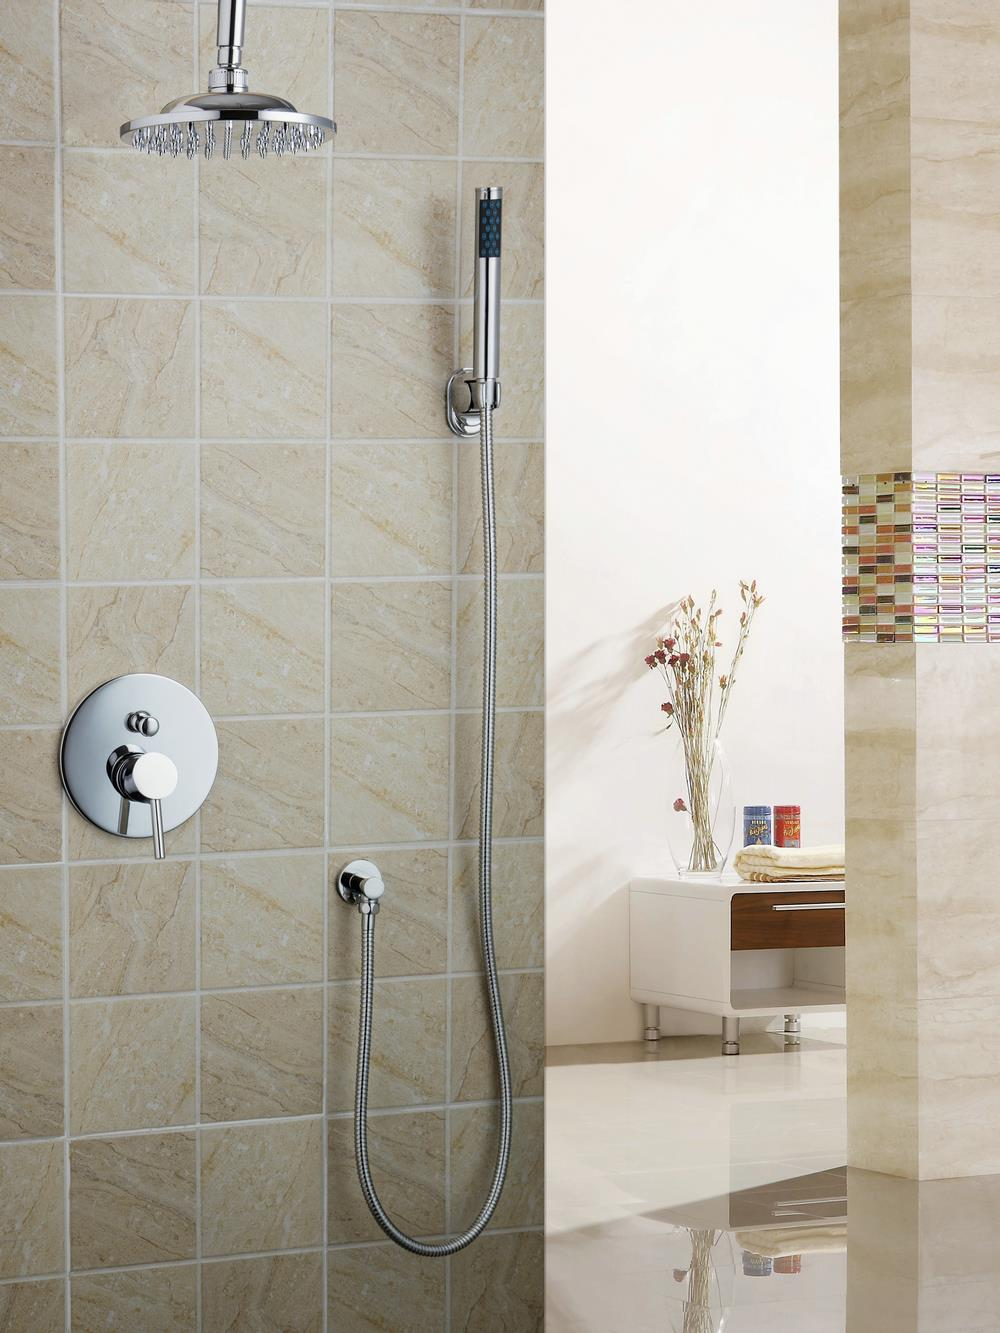 Bathroom Mixer Valve 8 Square Rain Handheld Shower Head Set Shower Set Torneira 50239-22A Bathtub Chrome Sink Faucet Mixer Tap shower faucets chrome silver wall mount bathroom faucet set rainfall square big shower head handheld valve bath mixer tap yb 608